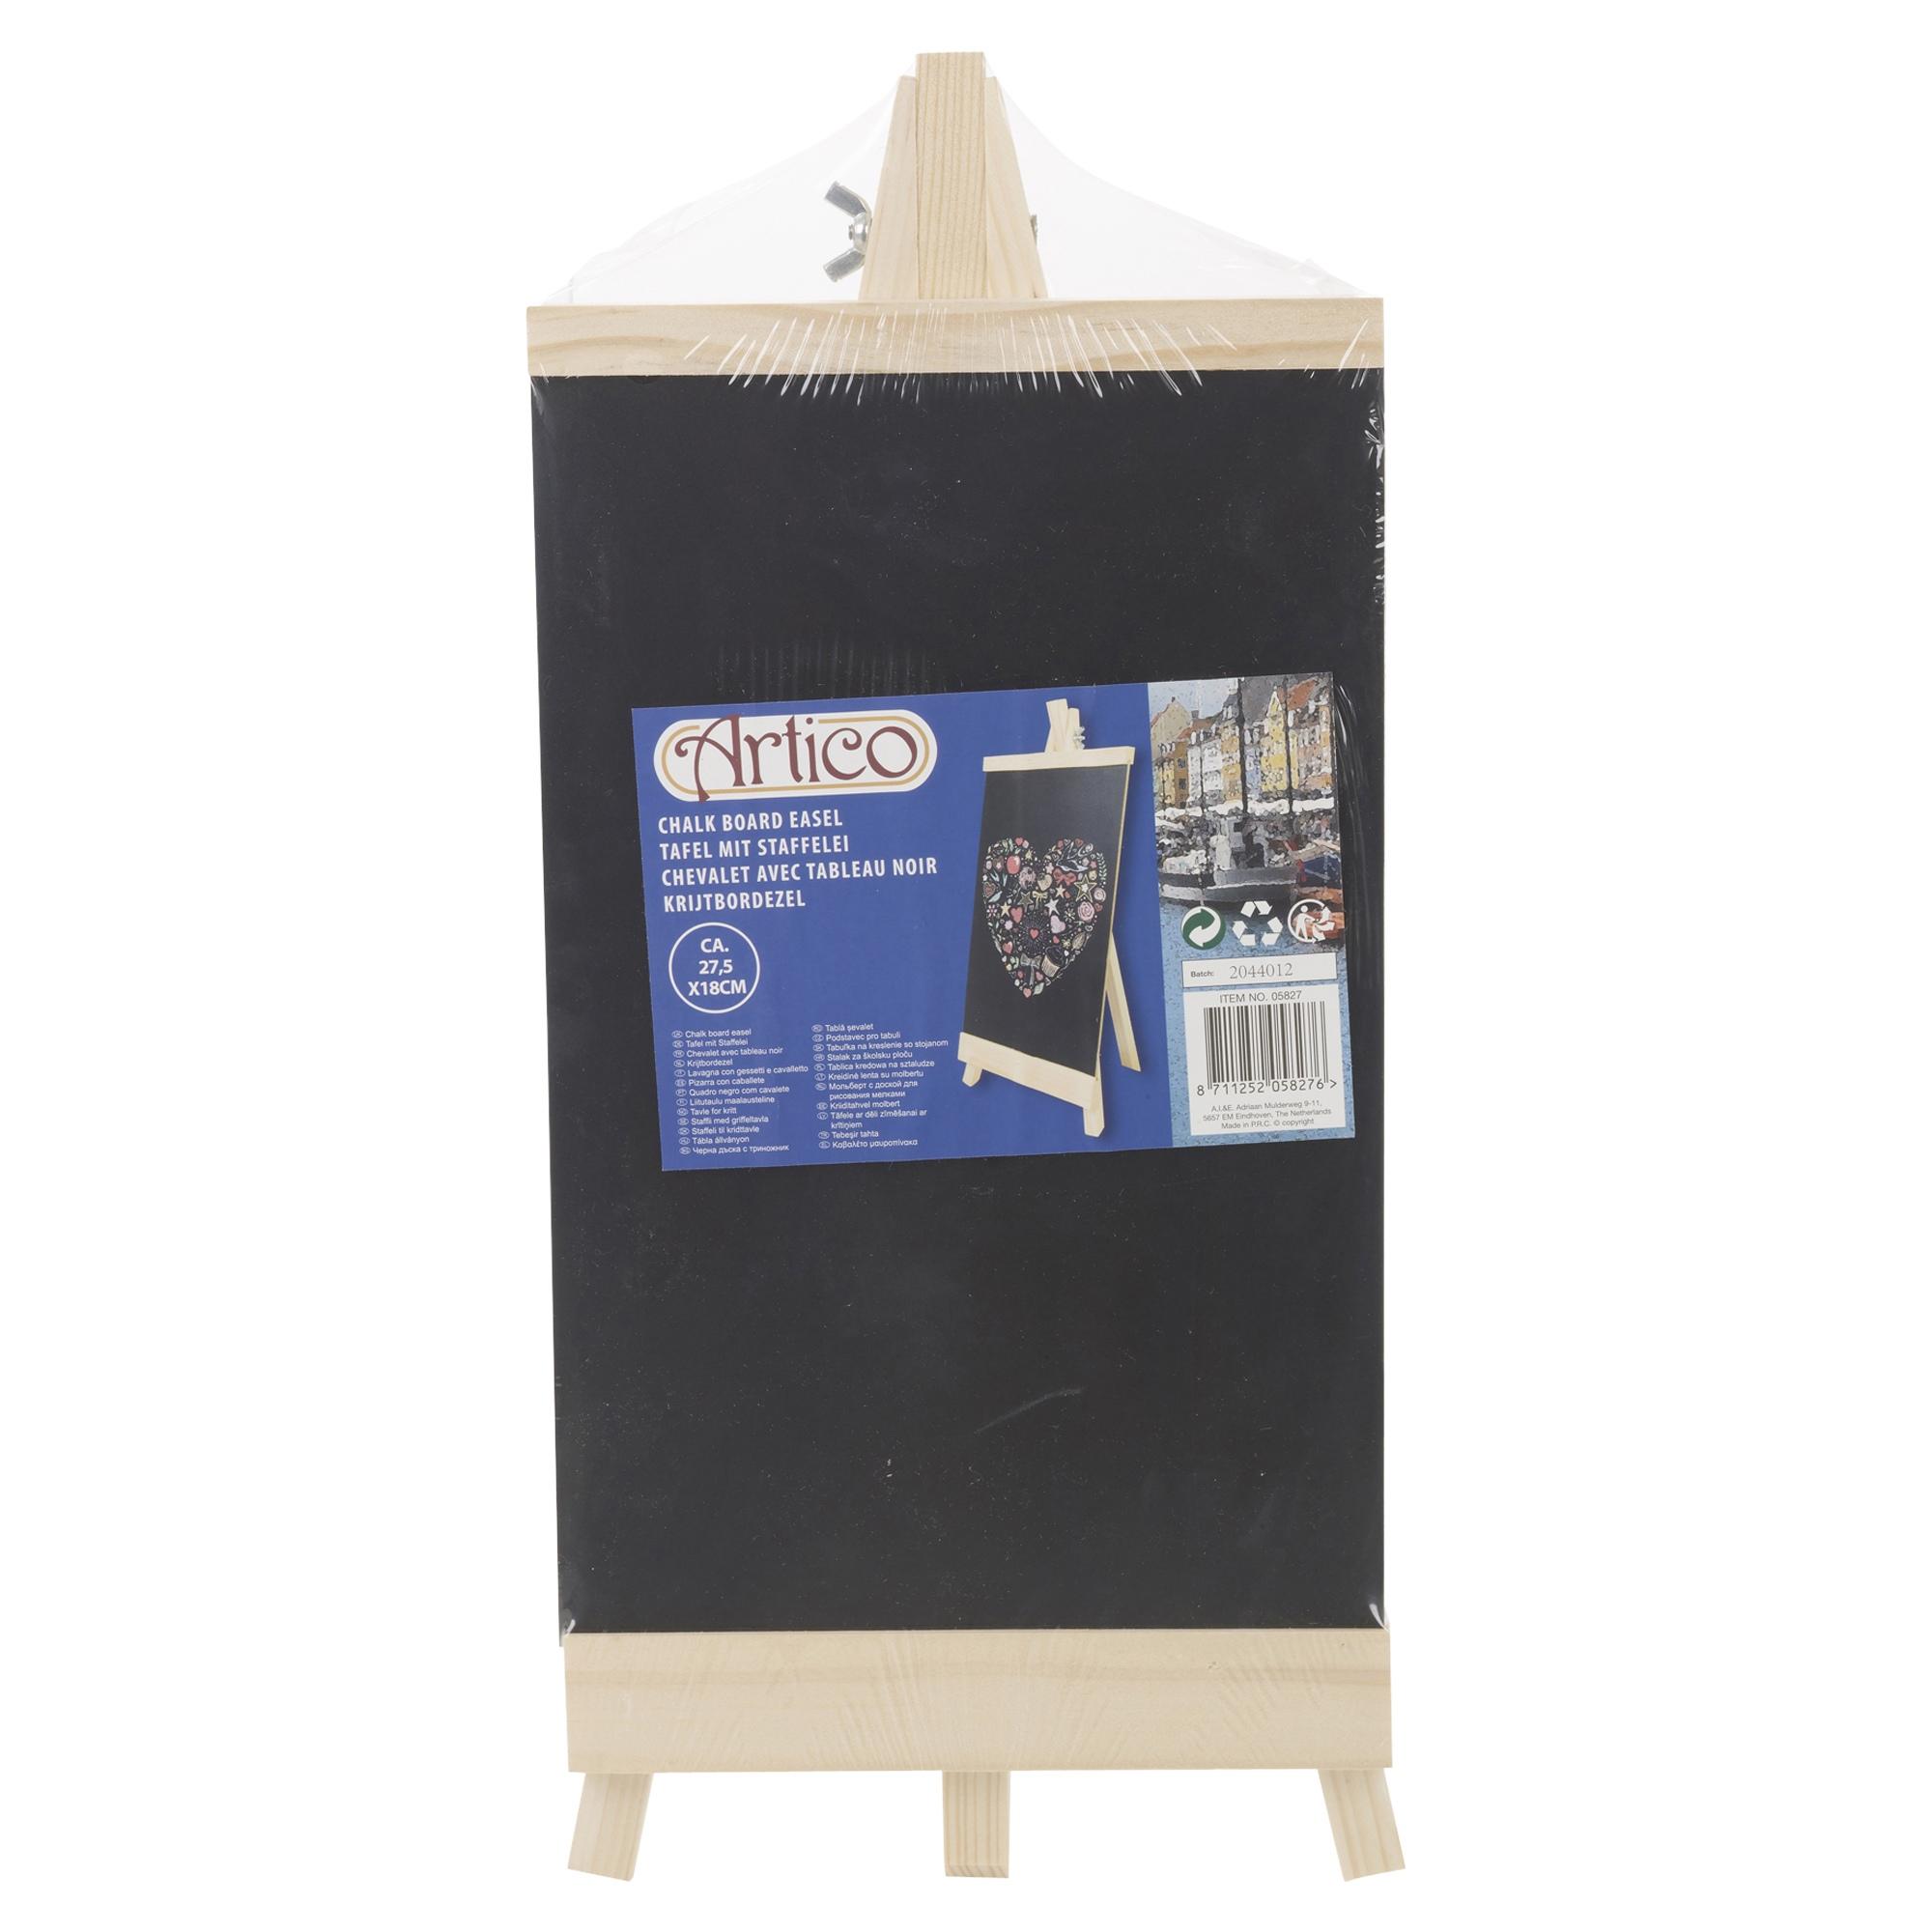 BNIB Chopping Board Design Memo Board Chalk Board Blackboard